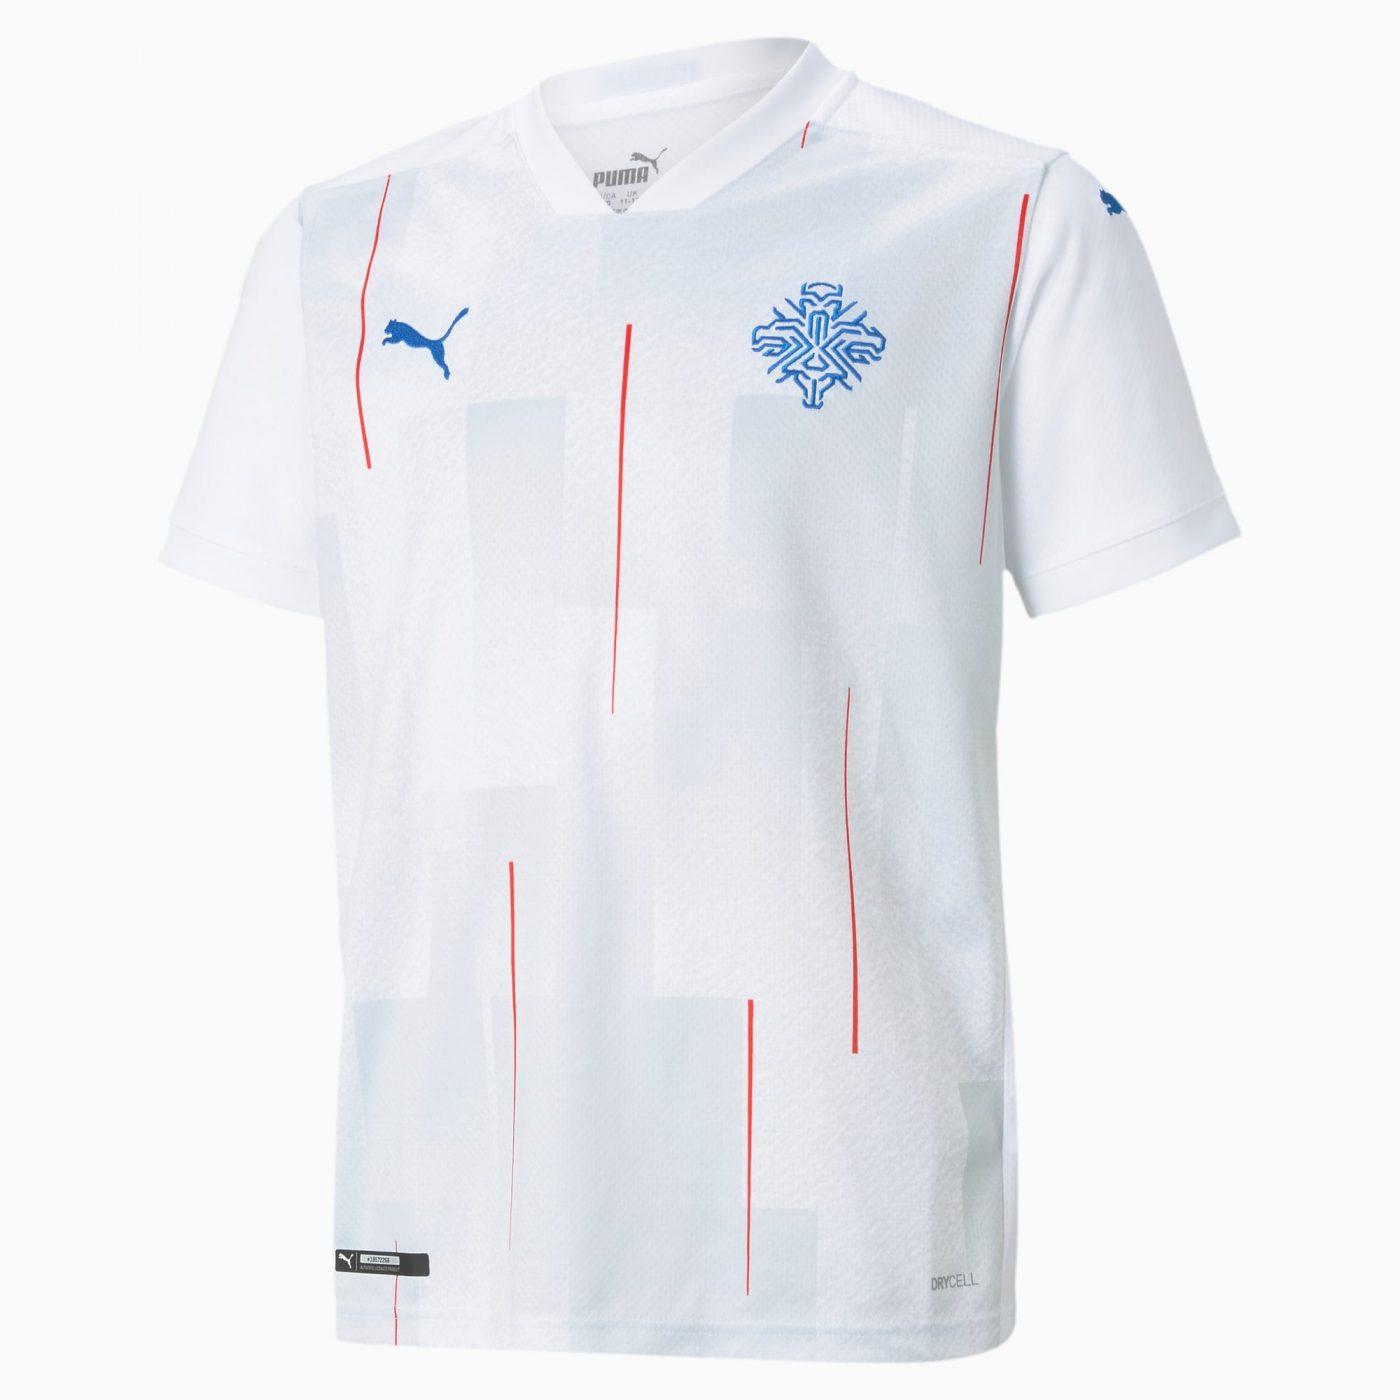 maillot-exterieur-islande-2020-2022-puma